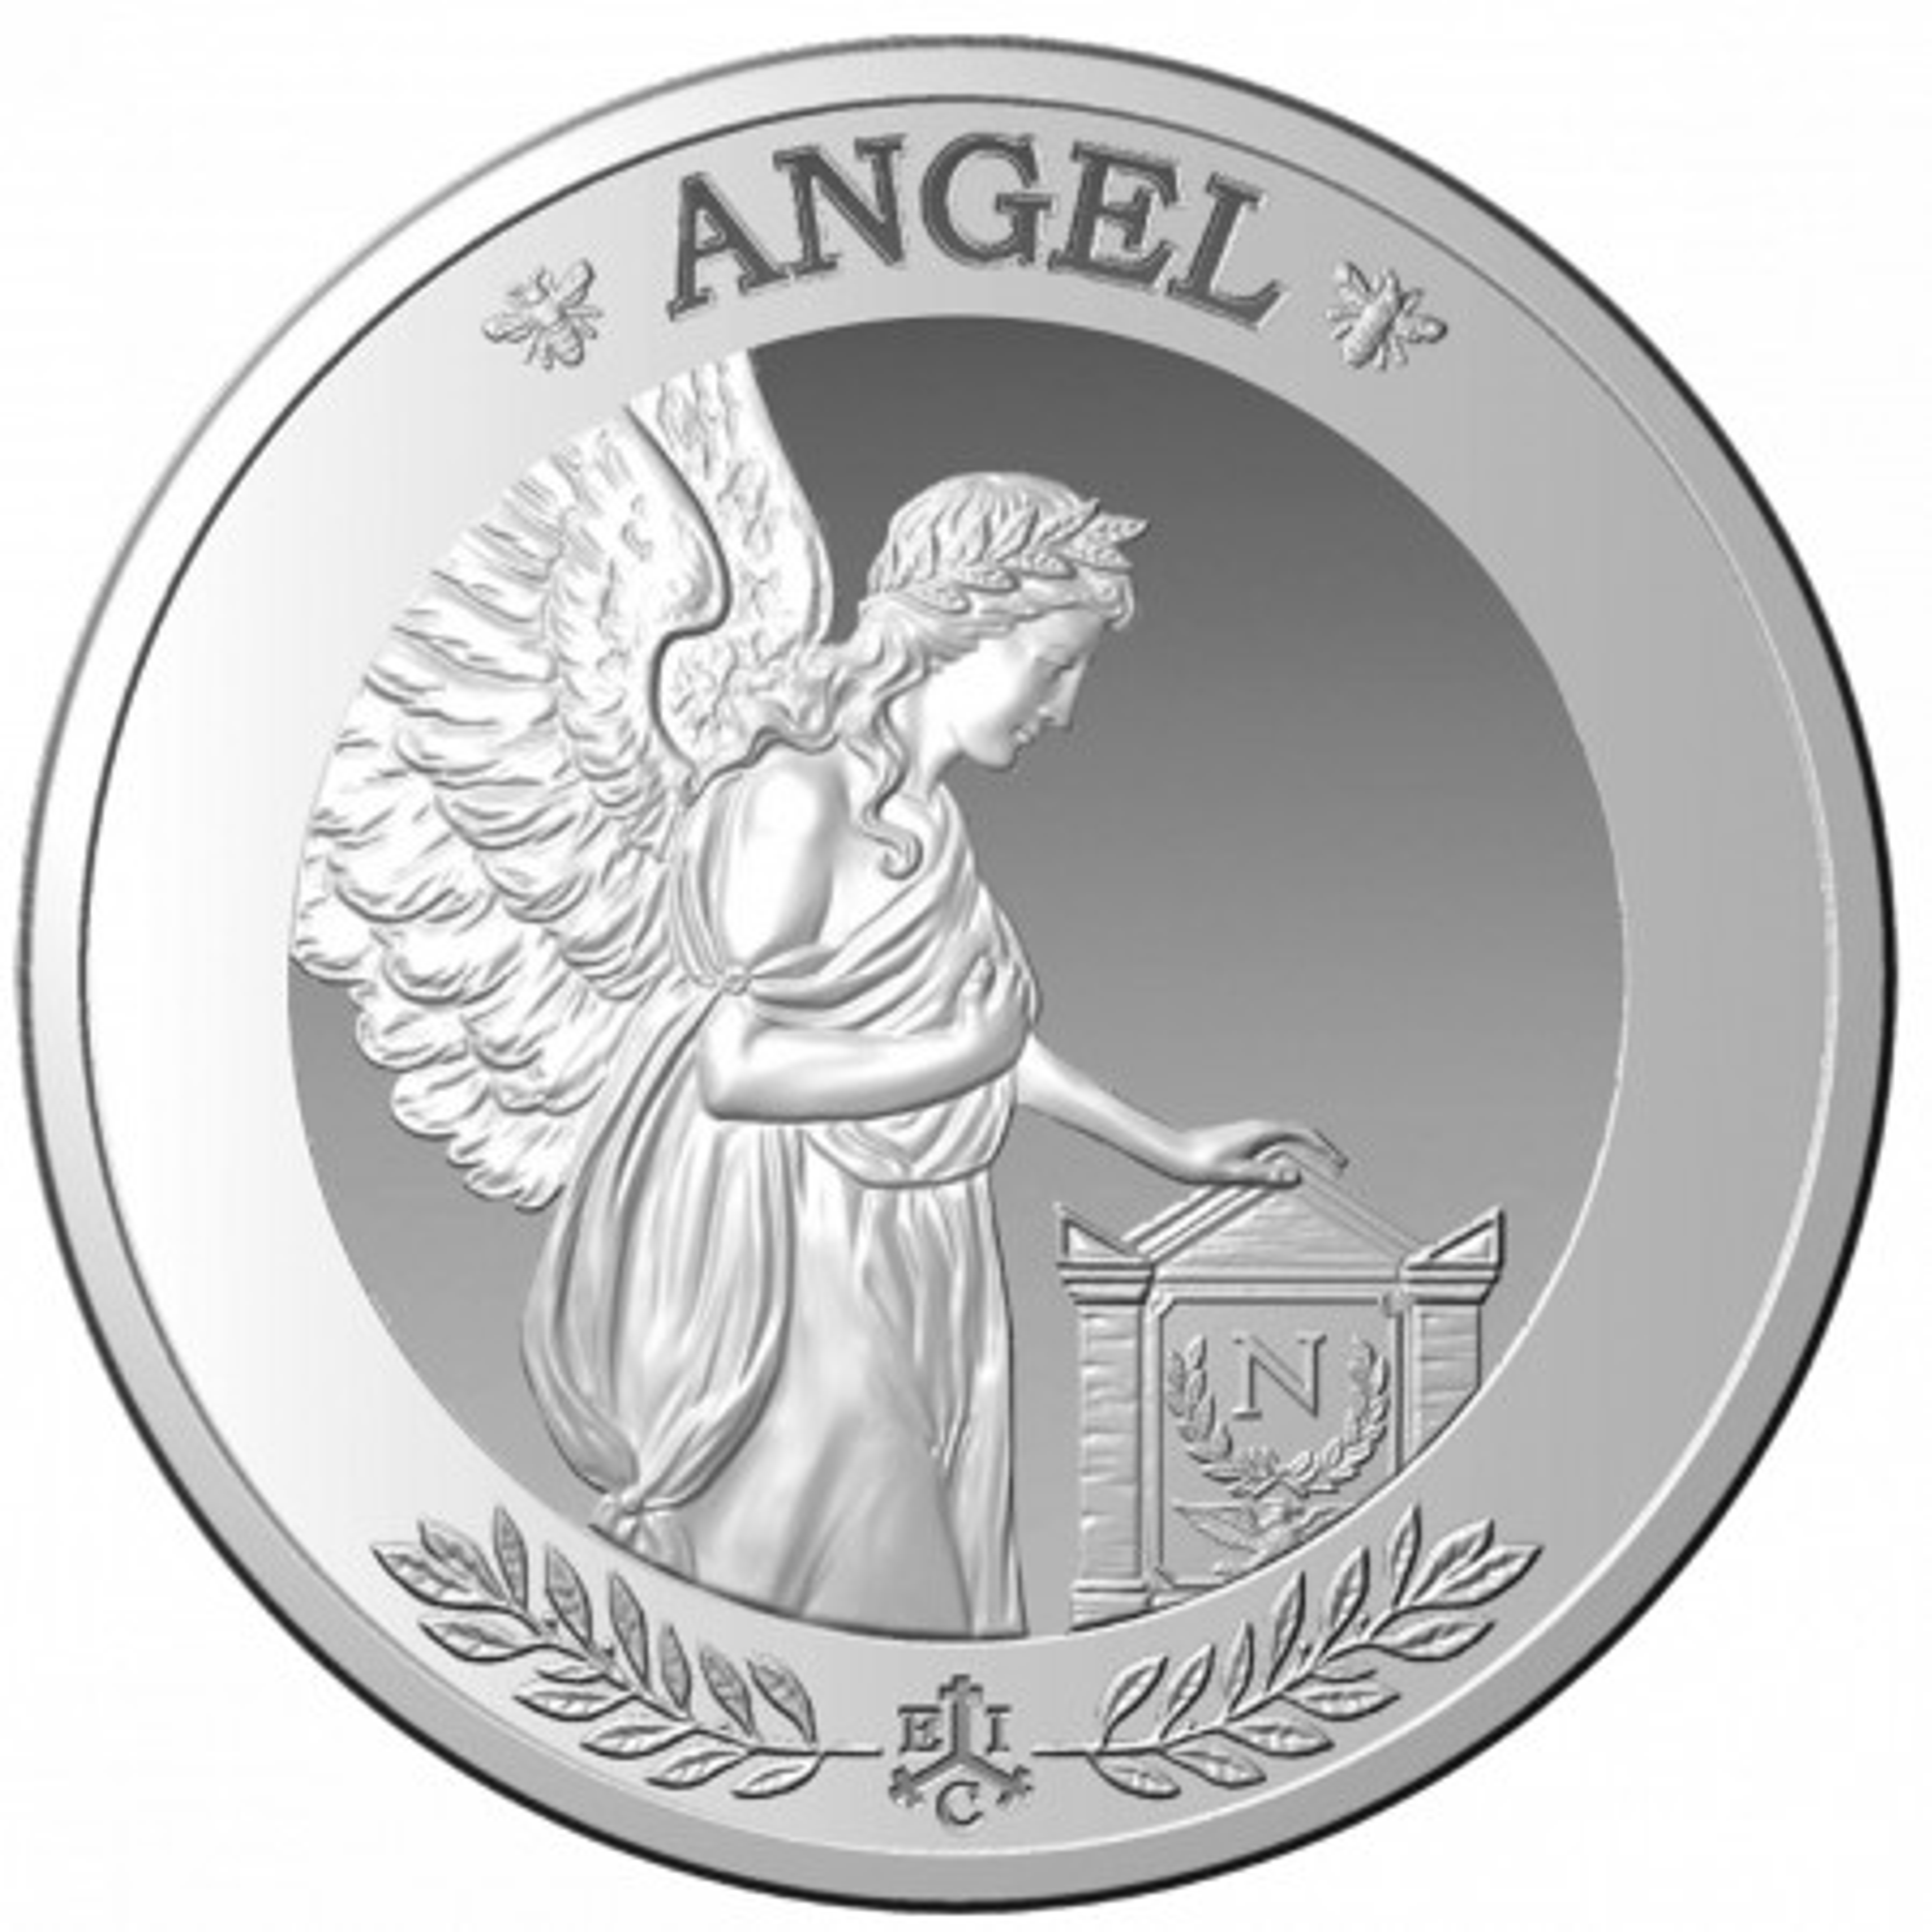 1 troy ounce zilveren munt Saint-Helena engel 2021 Proof